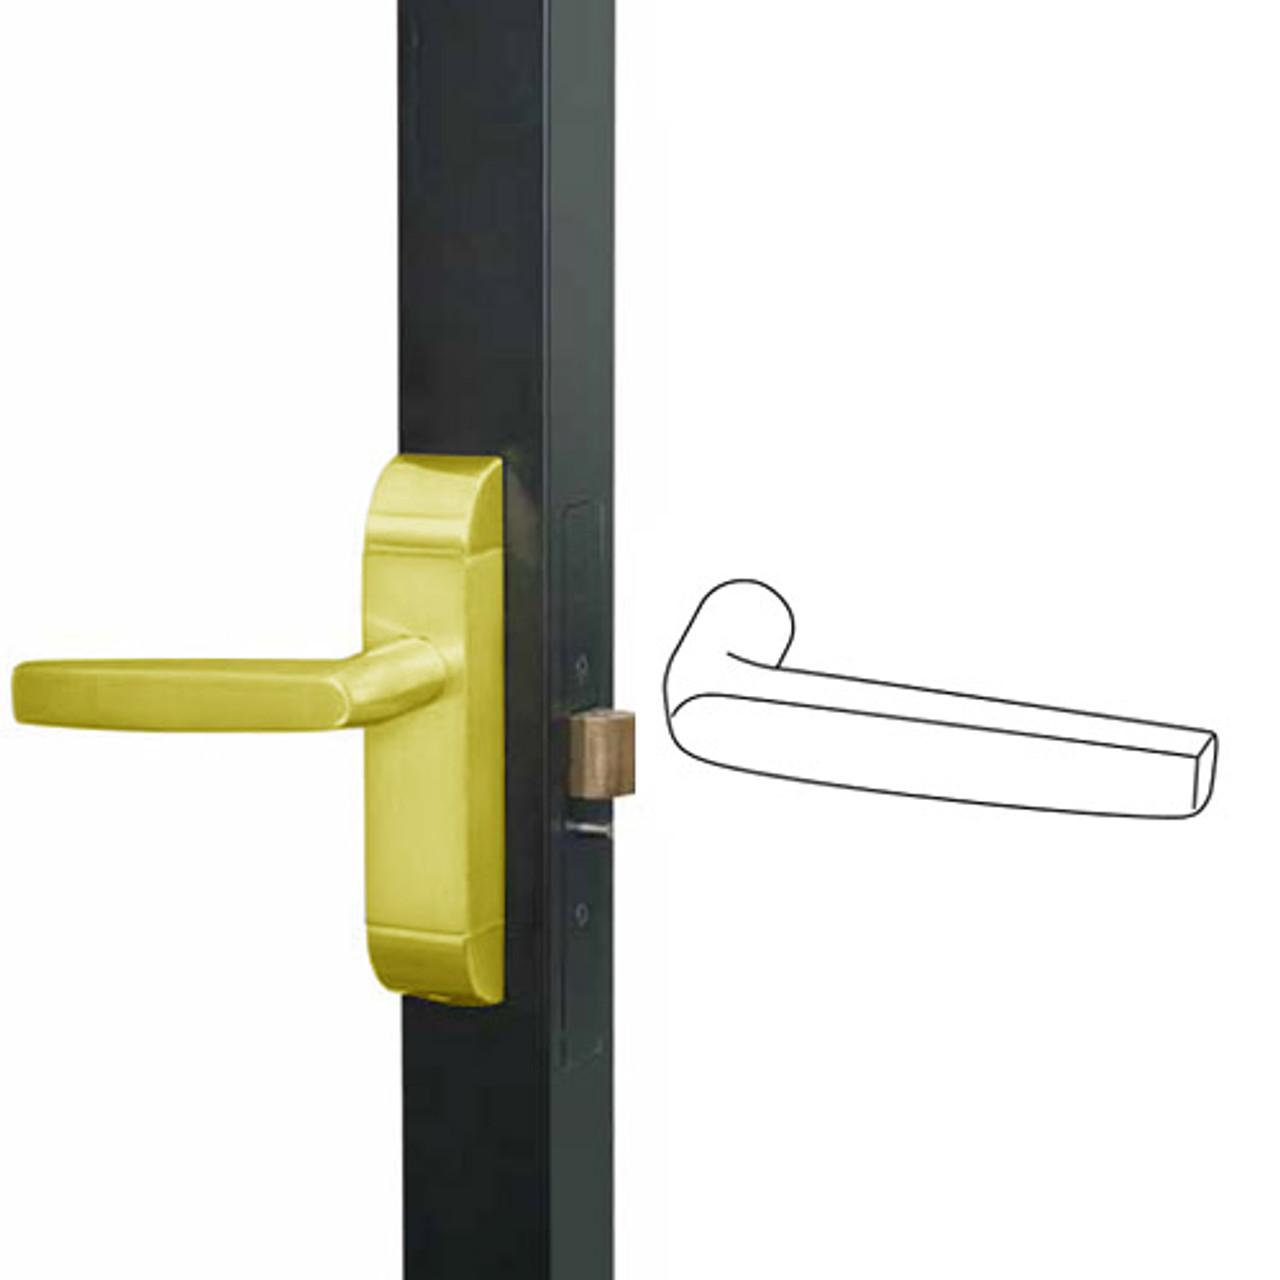 4600-MJ-542-US3 Adams Rite MJ Designer Deadlatch handle in Bright Brass Finish